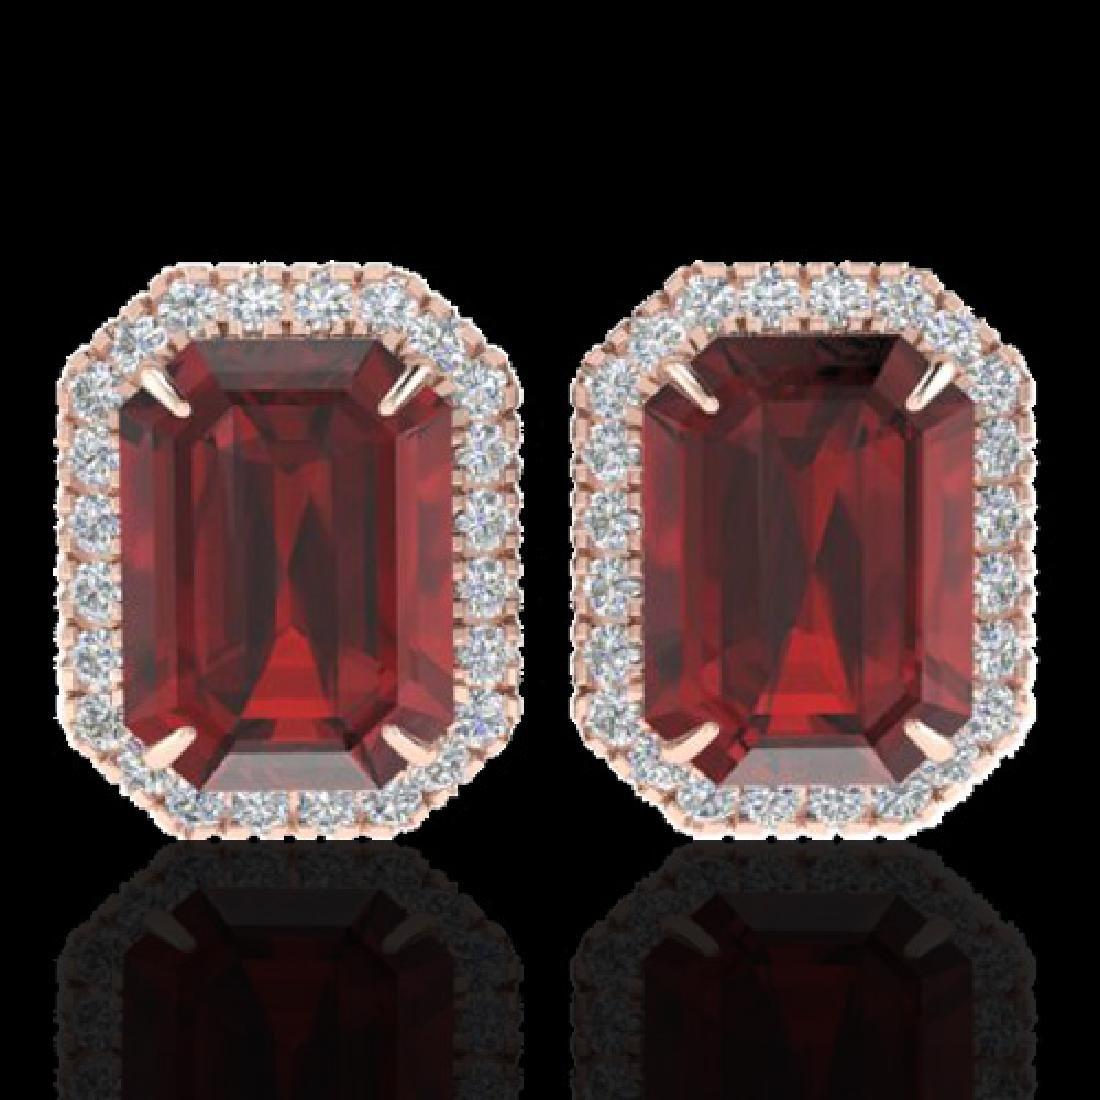 12 CTW Garnet And Micro Pave VS/SI Diamond Halo